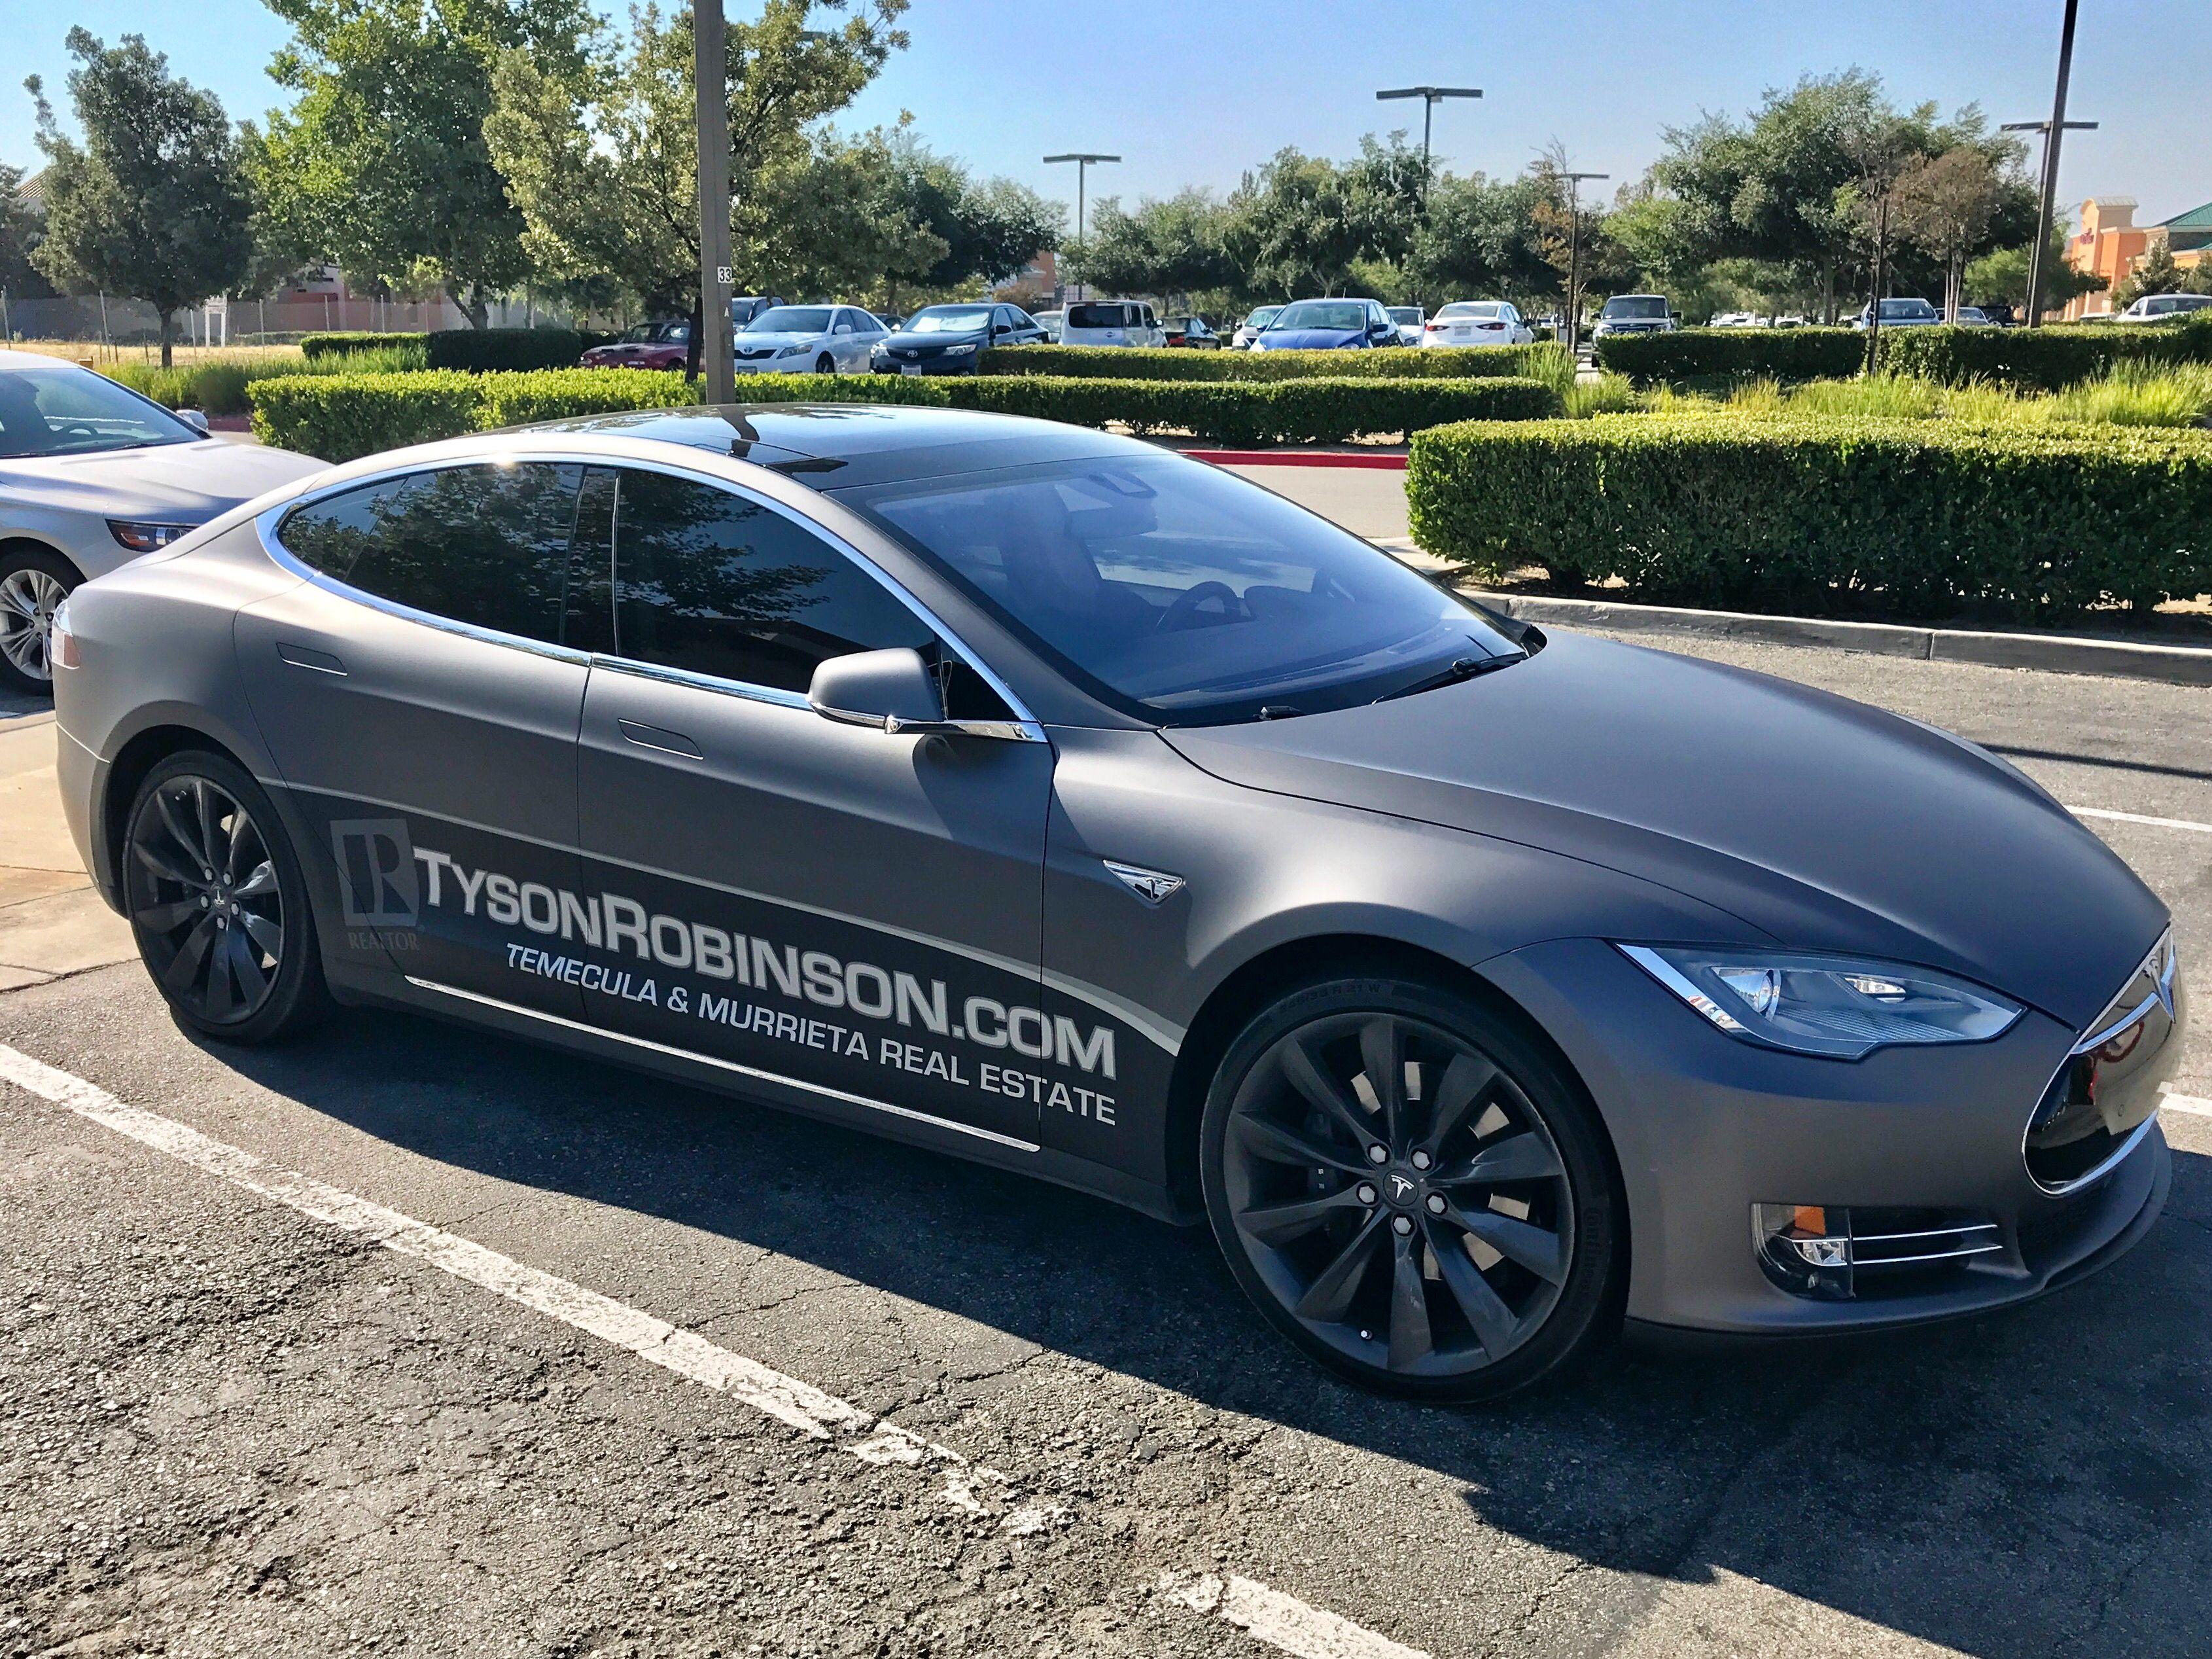 Tesla Model S With Matte Gray Wrap Www Tysonrobinson Com Temecula And Murrieta Real Estate Tesla Model S Tesla Model Tesla